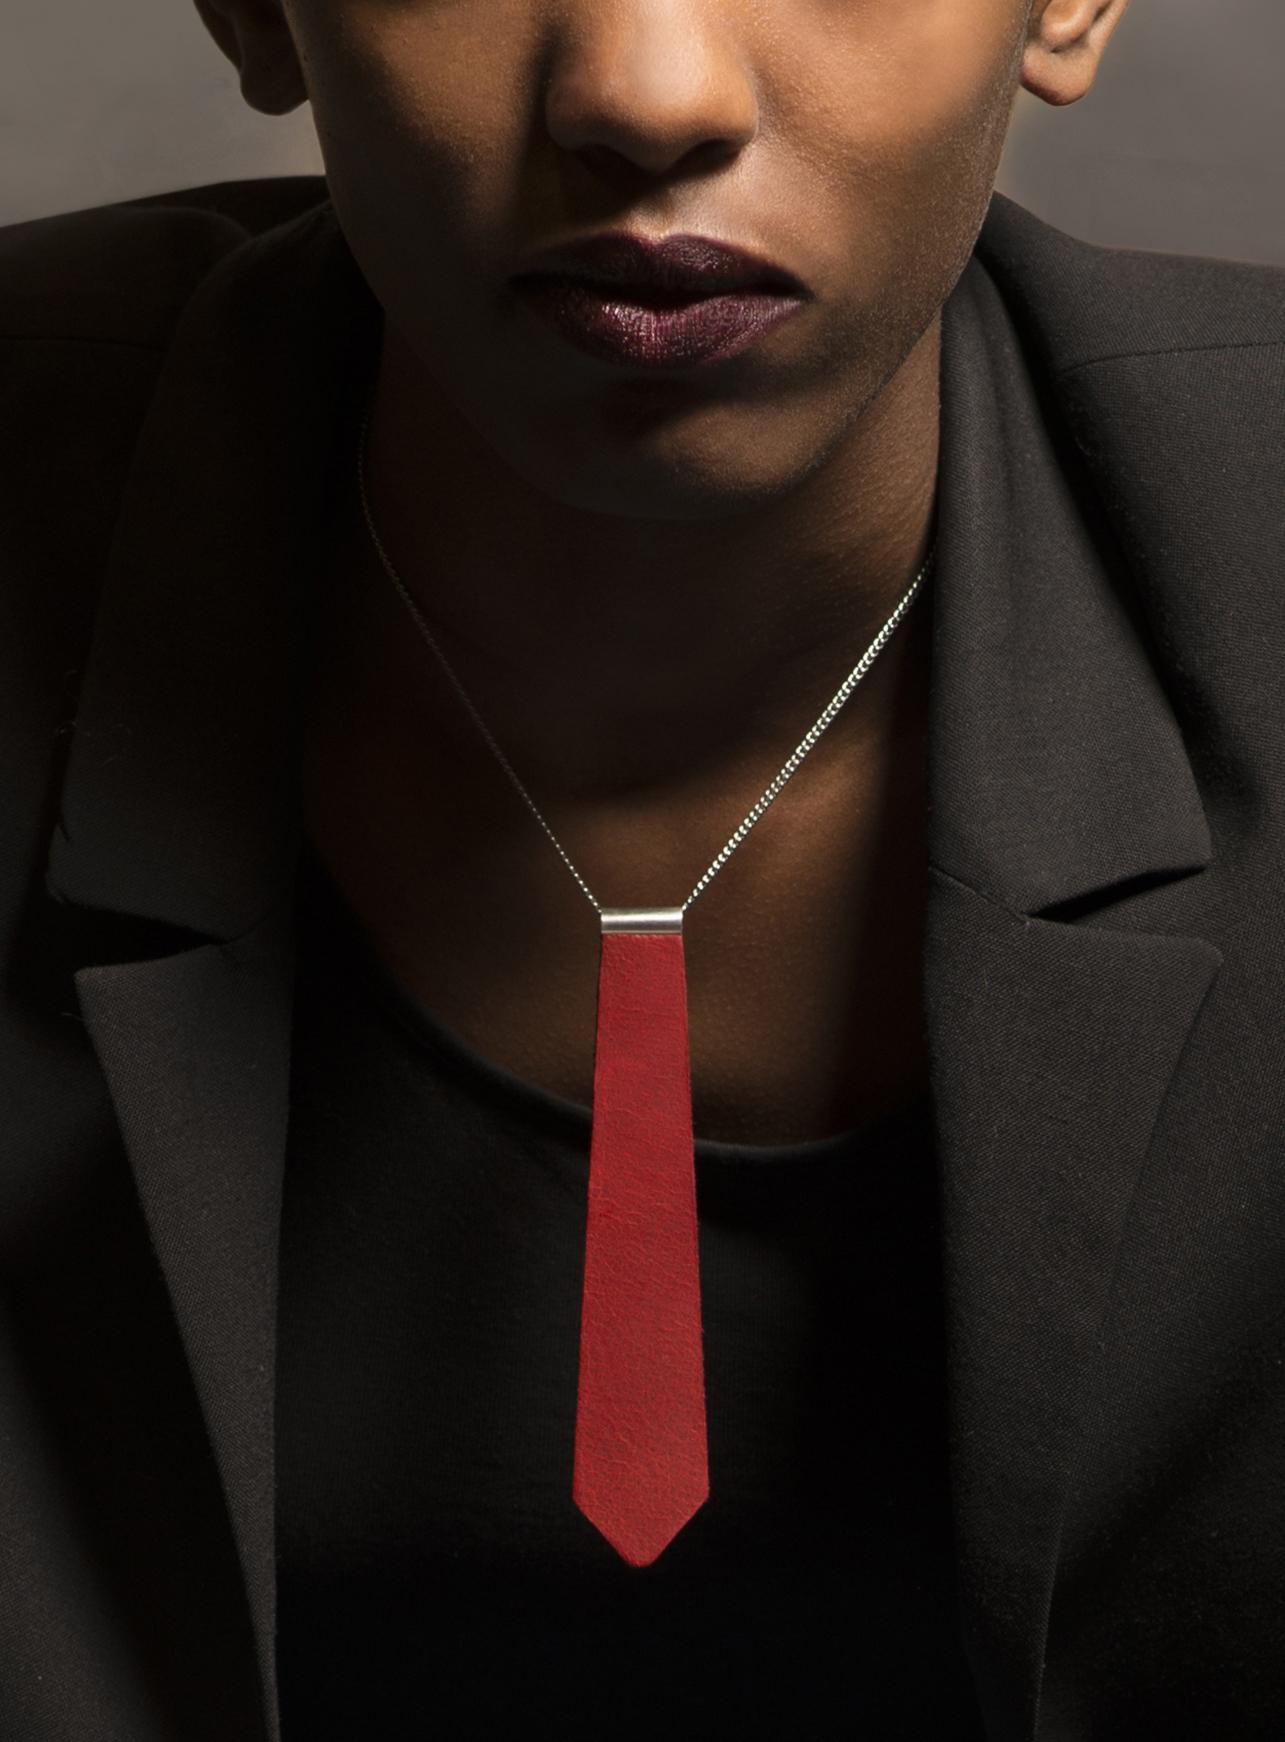 My Tie Necklace